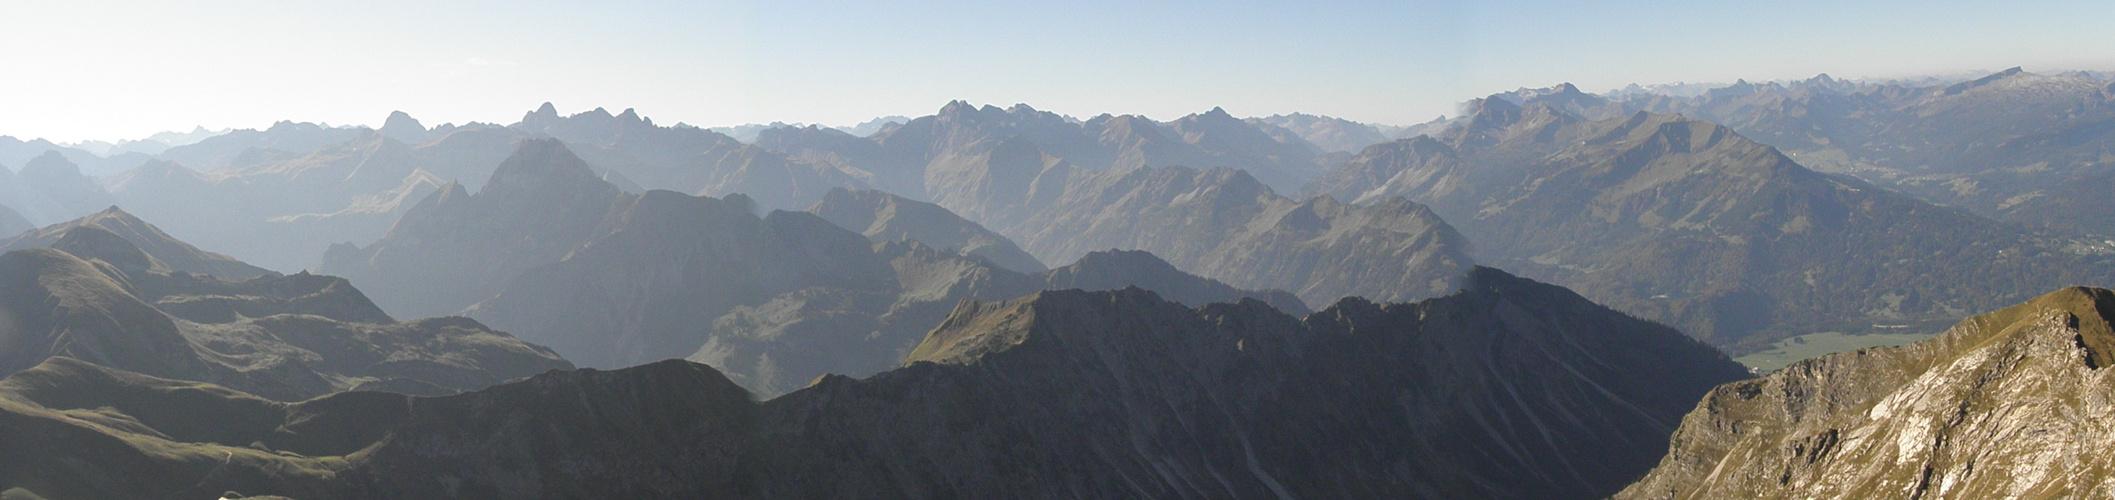 Nebelhorn-Gipfelpanorama